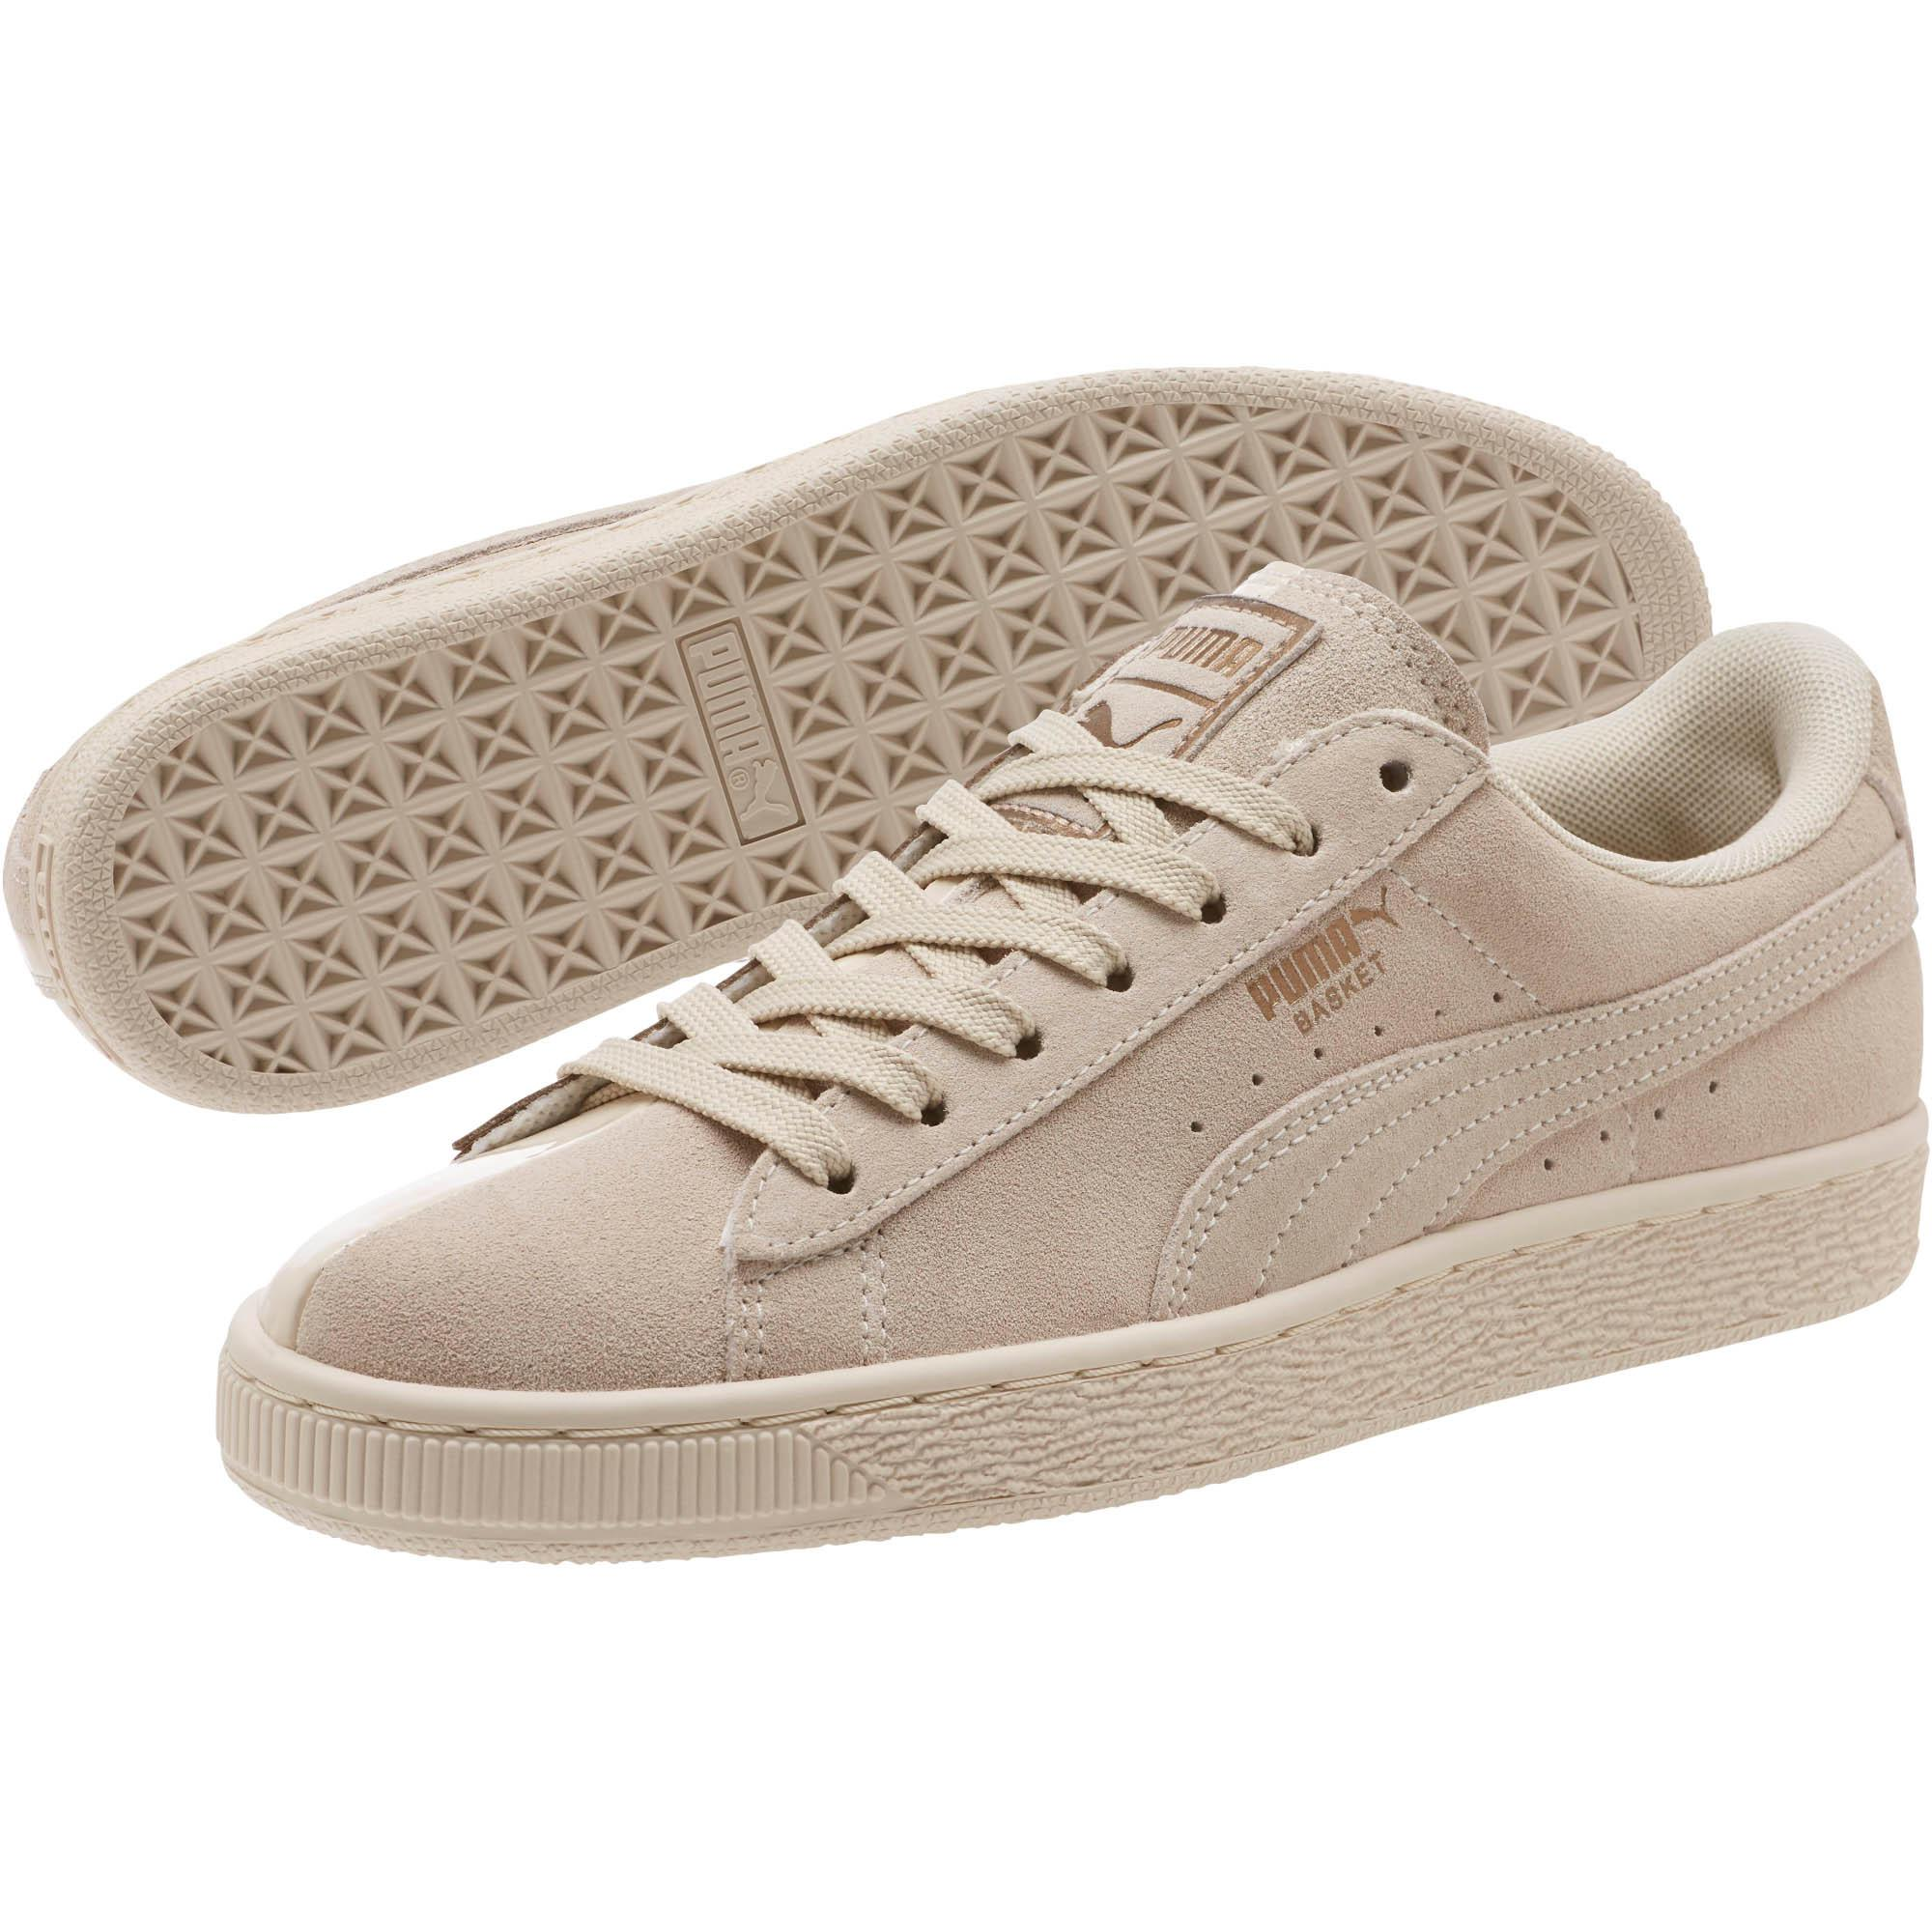 35e6d0a79a2 PUMA - Multicolor Basket Classic Lunarglow Sneakers - Lyst. View fullscreen